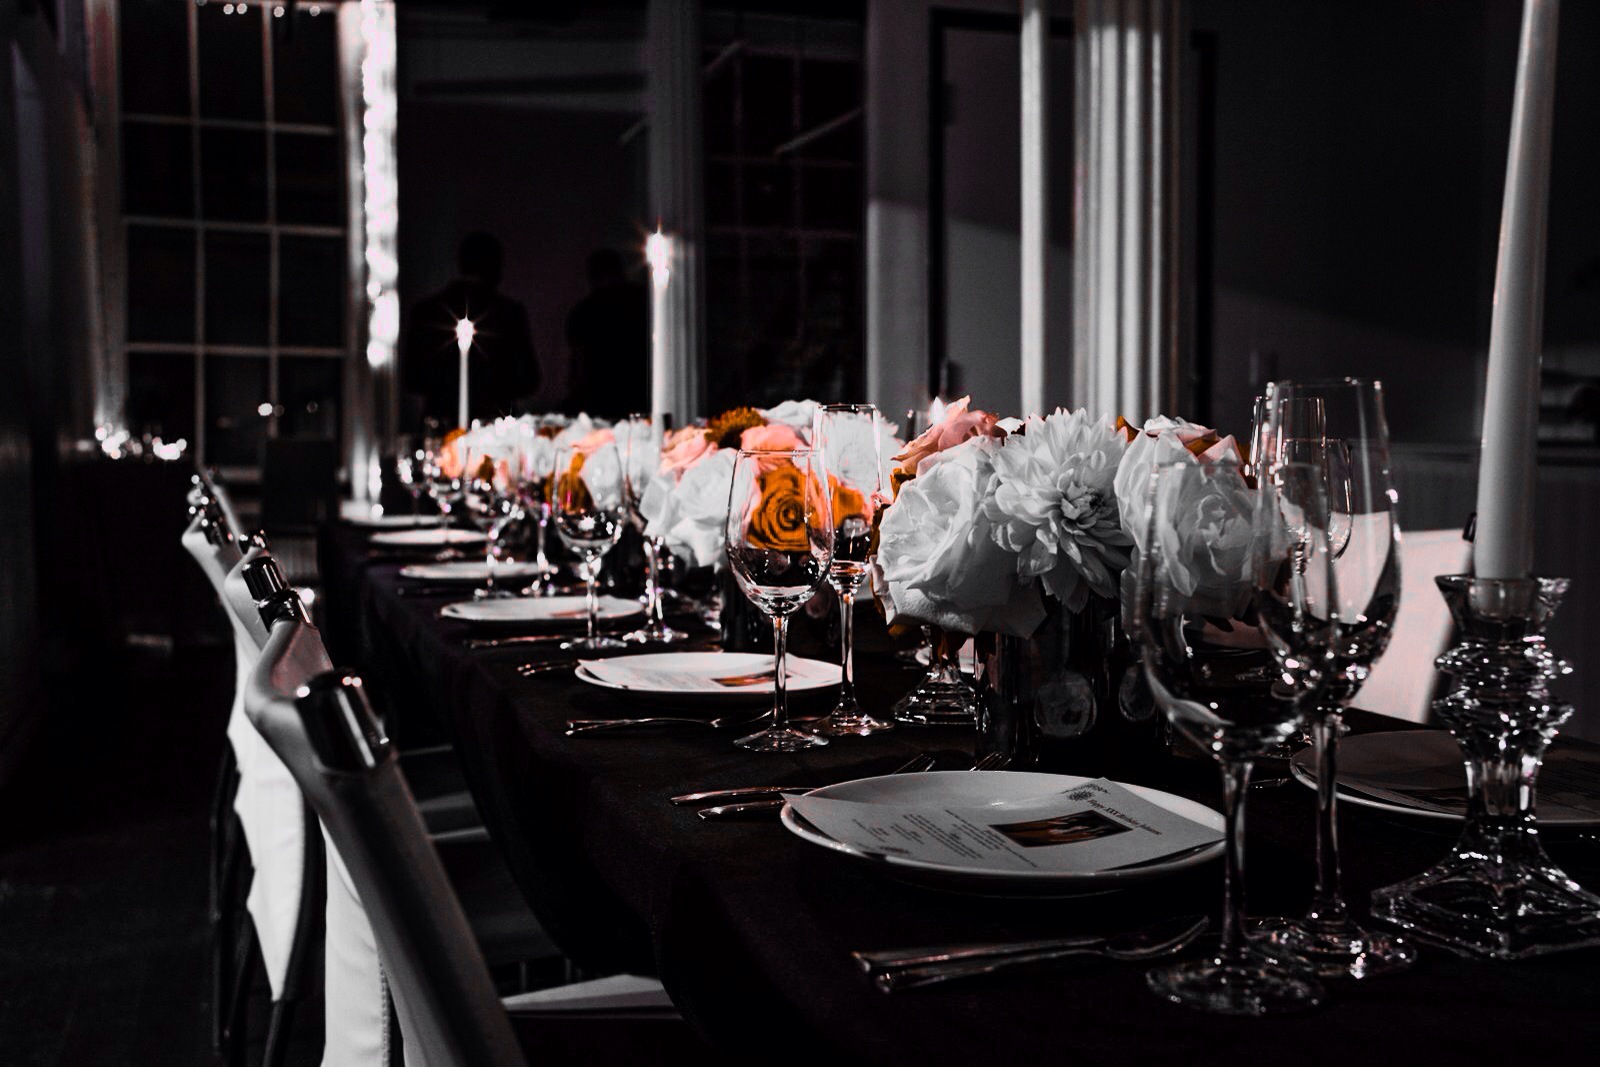 Private dining W OmarsKitchen  omarskitchencom